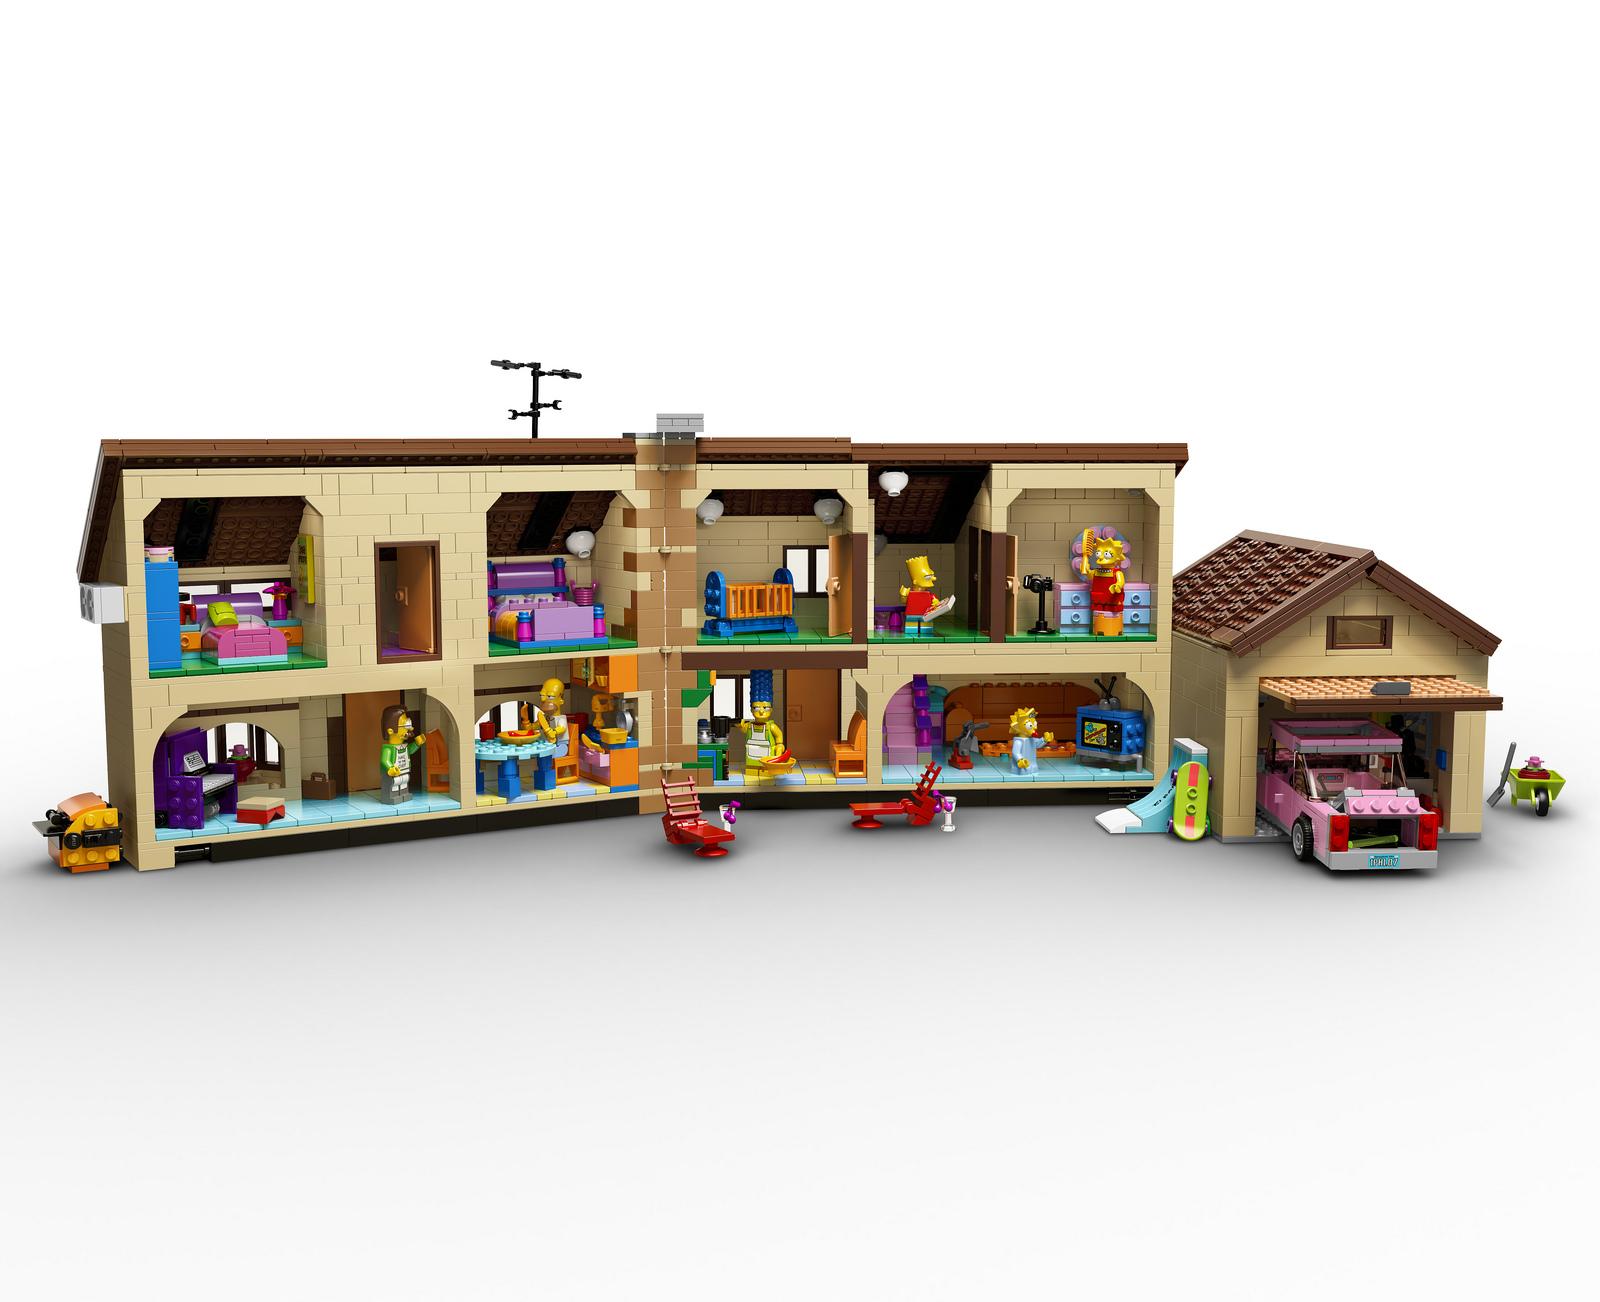 Maison-Lego-Simpsons-06